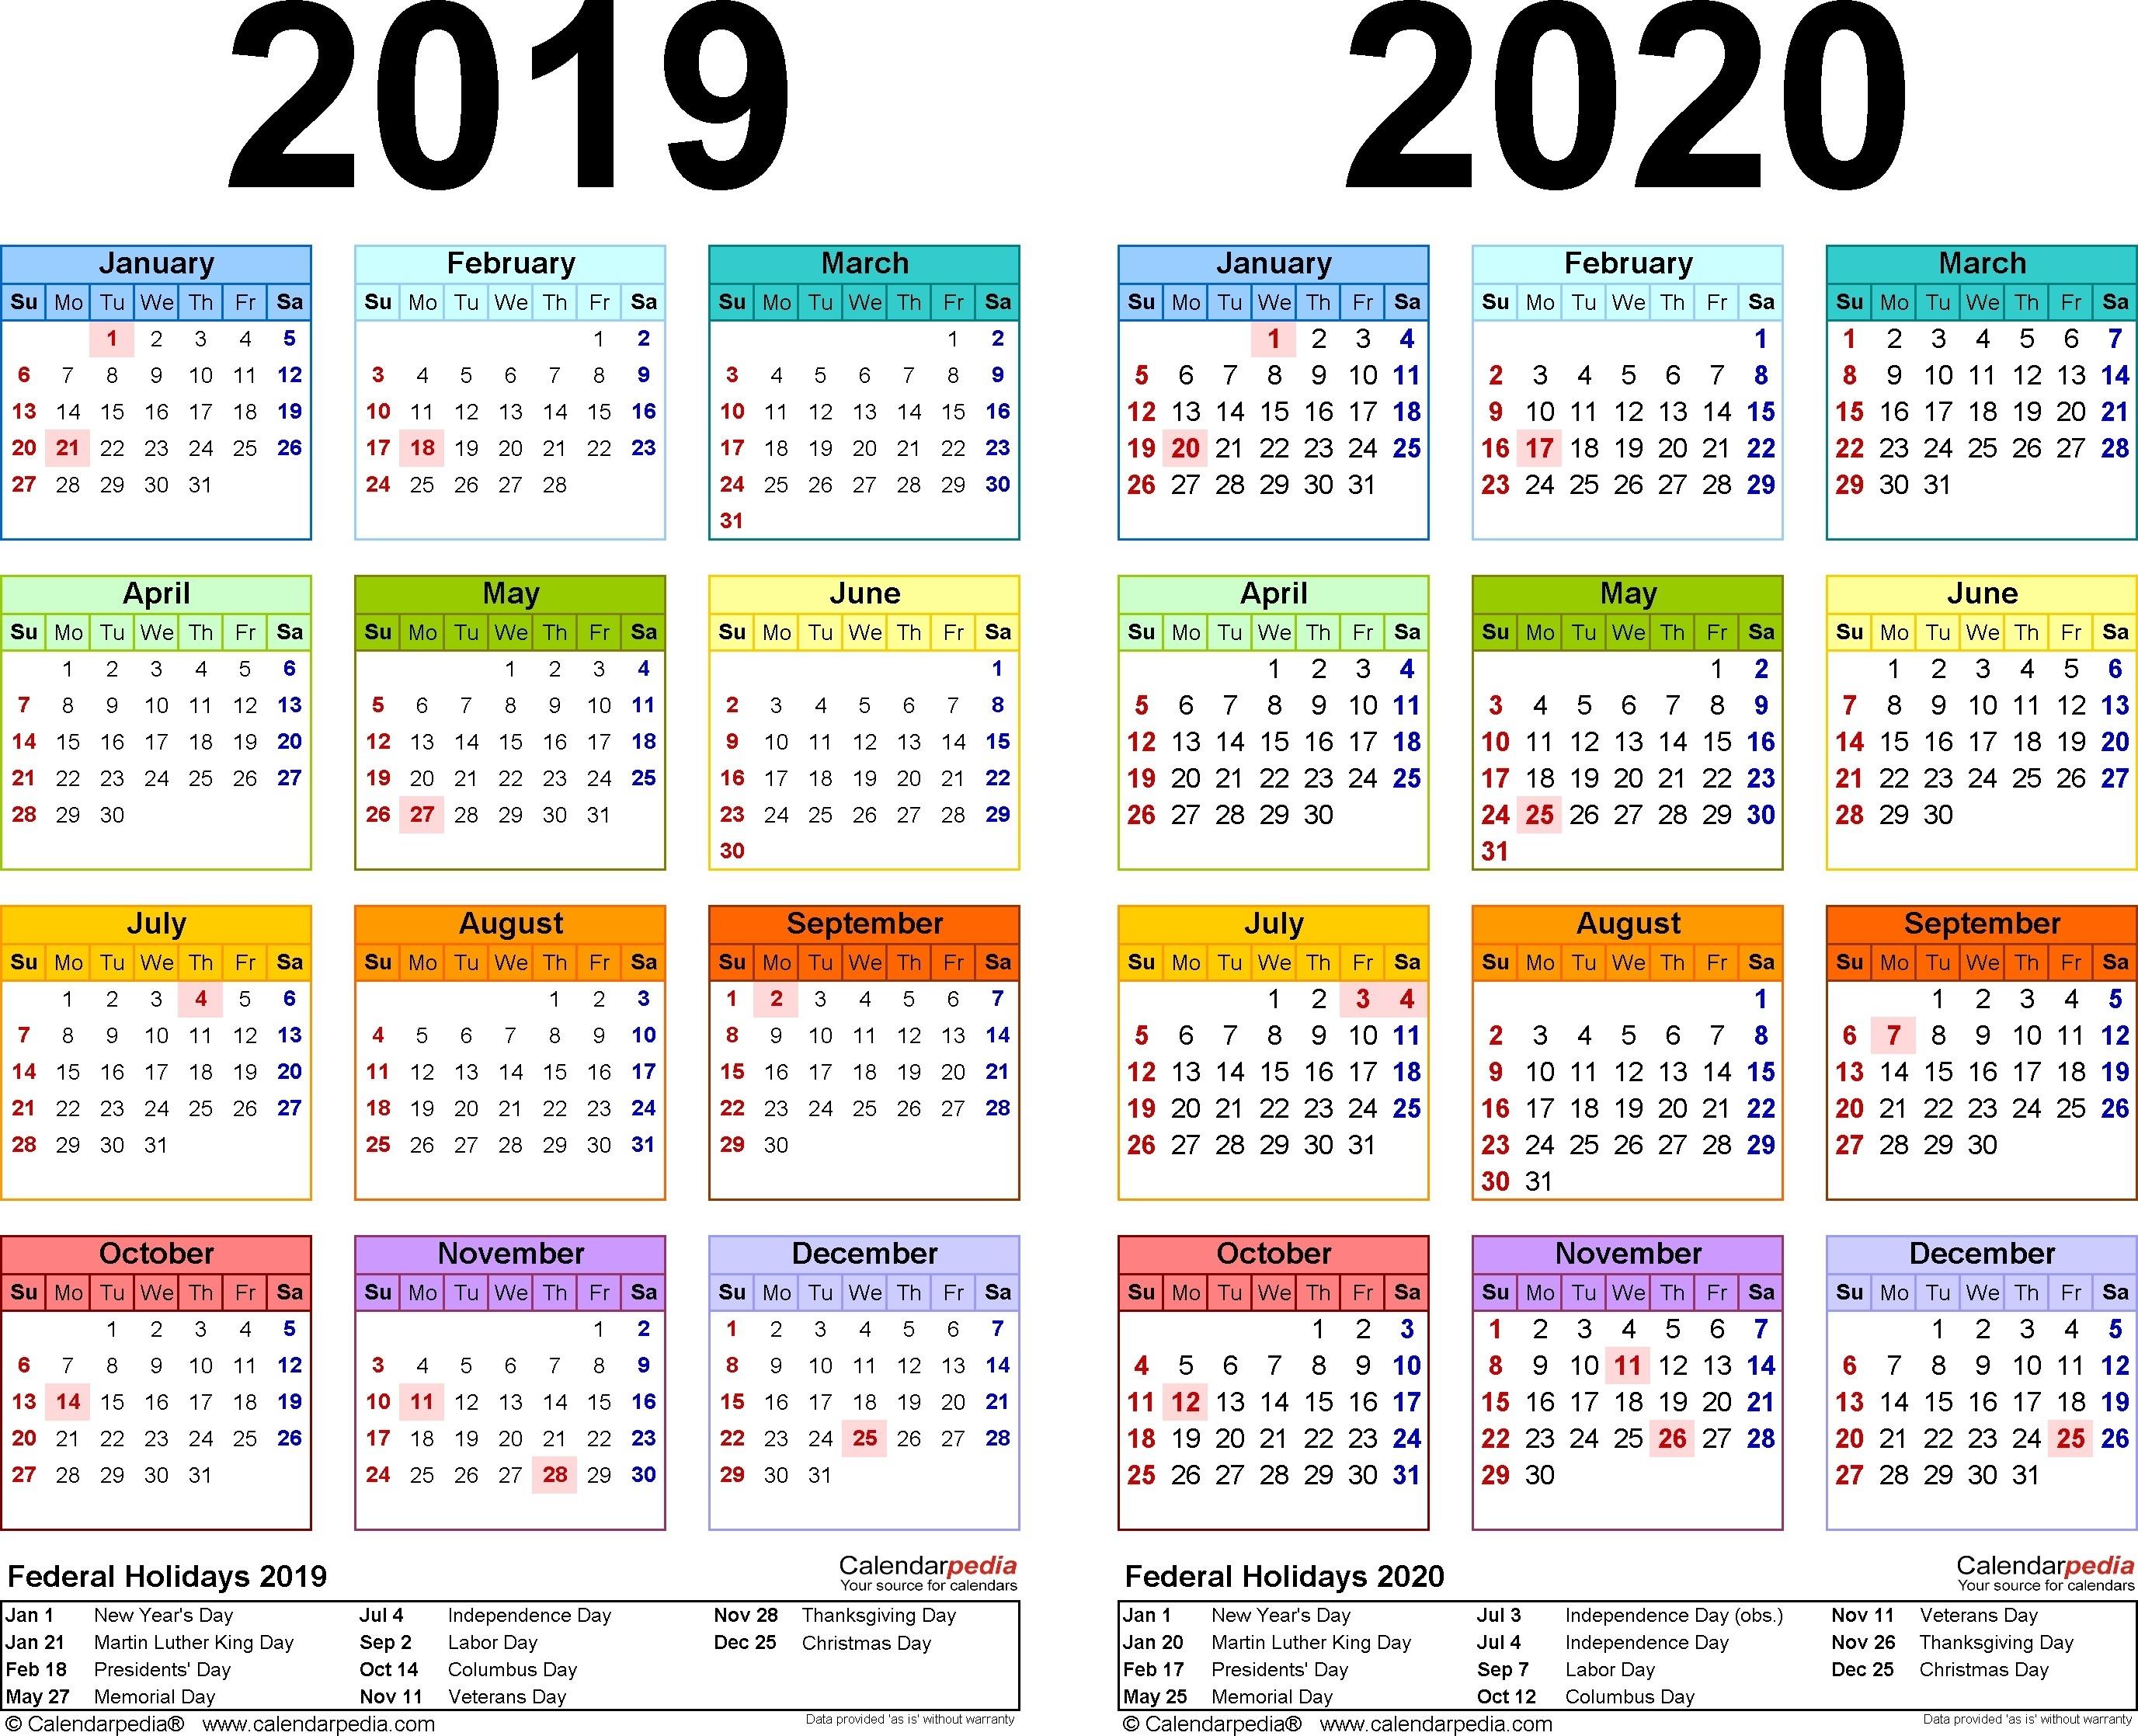 Perky 2020 Calendar School Holidays • Printable Blank Calendar Template_School Calendar Wa 2020